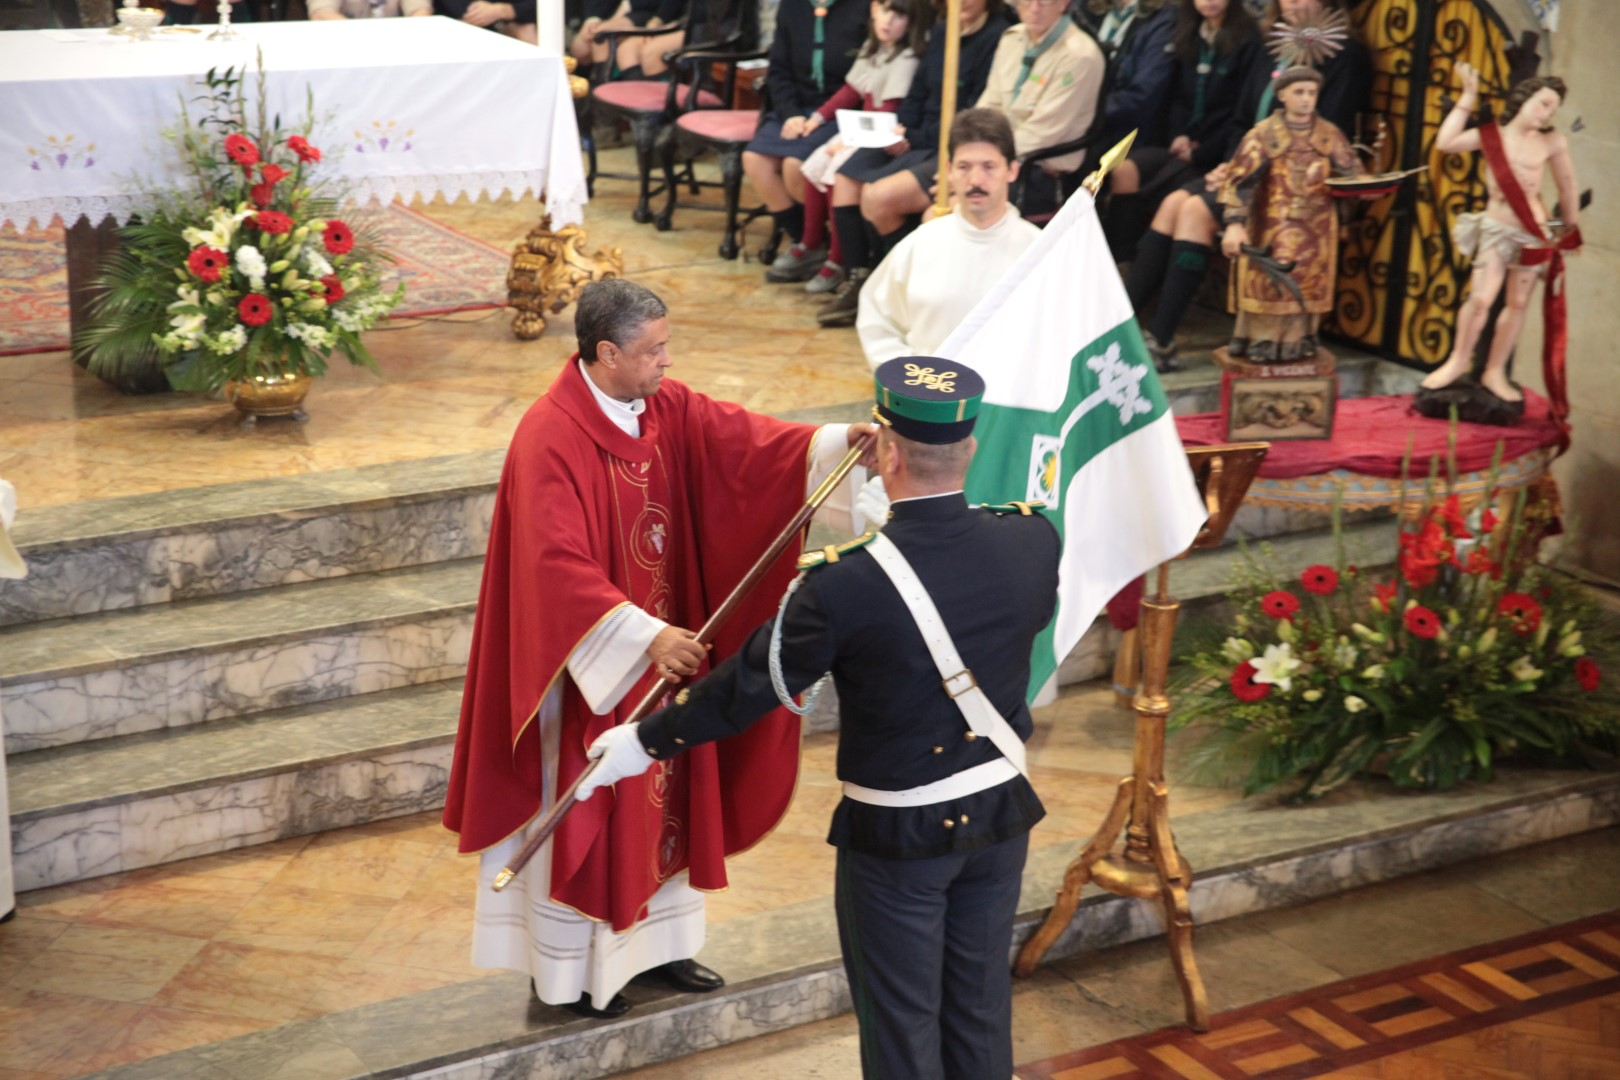 GNR_Missa do dia do Comando Territorial de Faro 2015